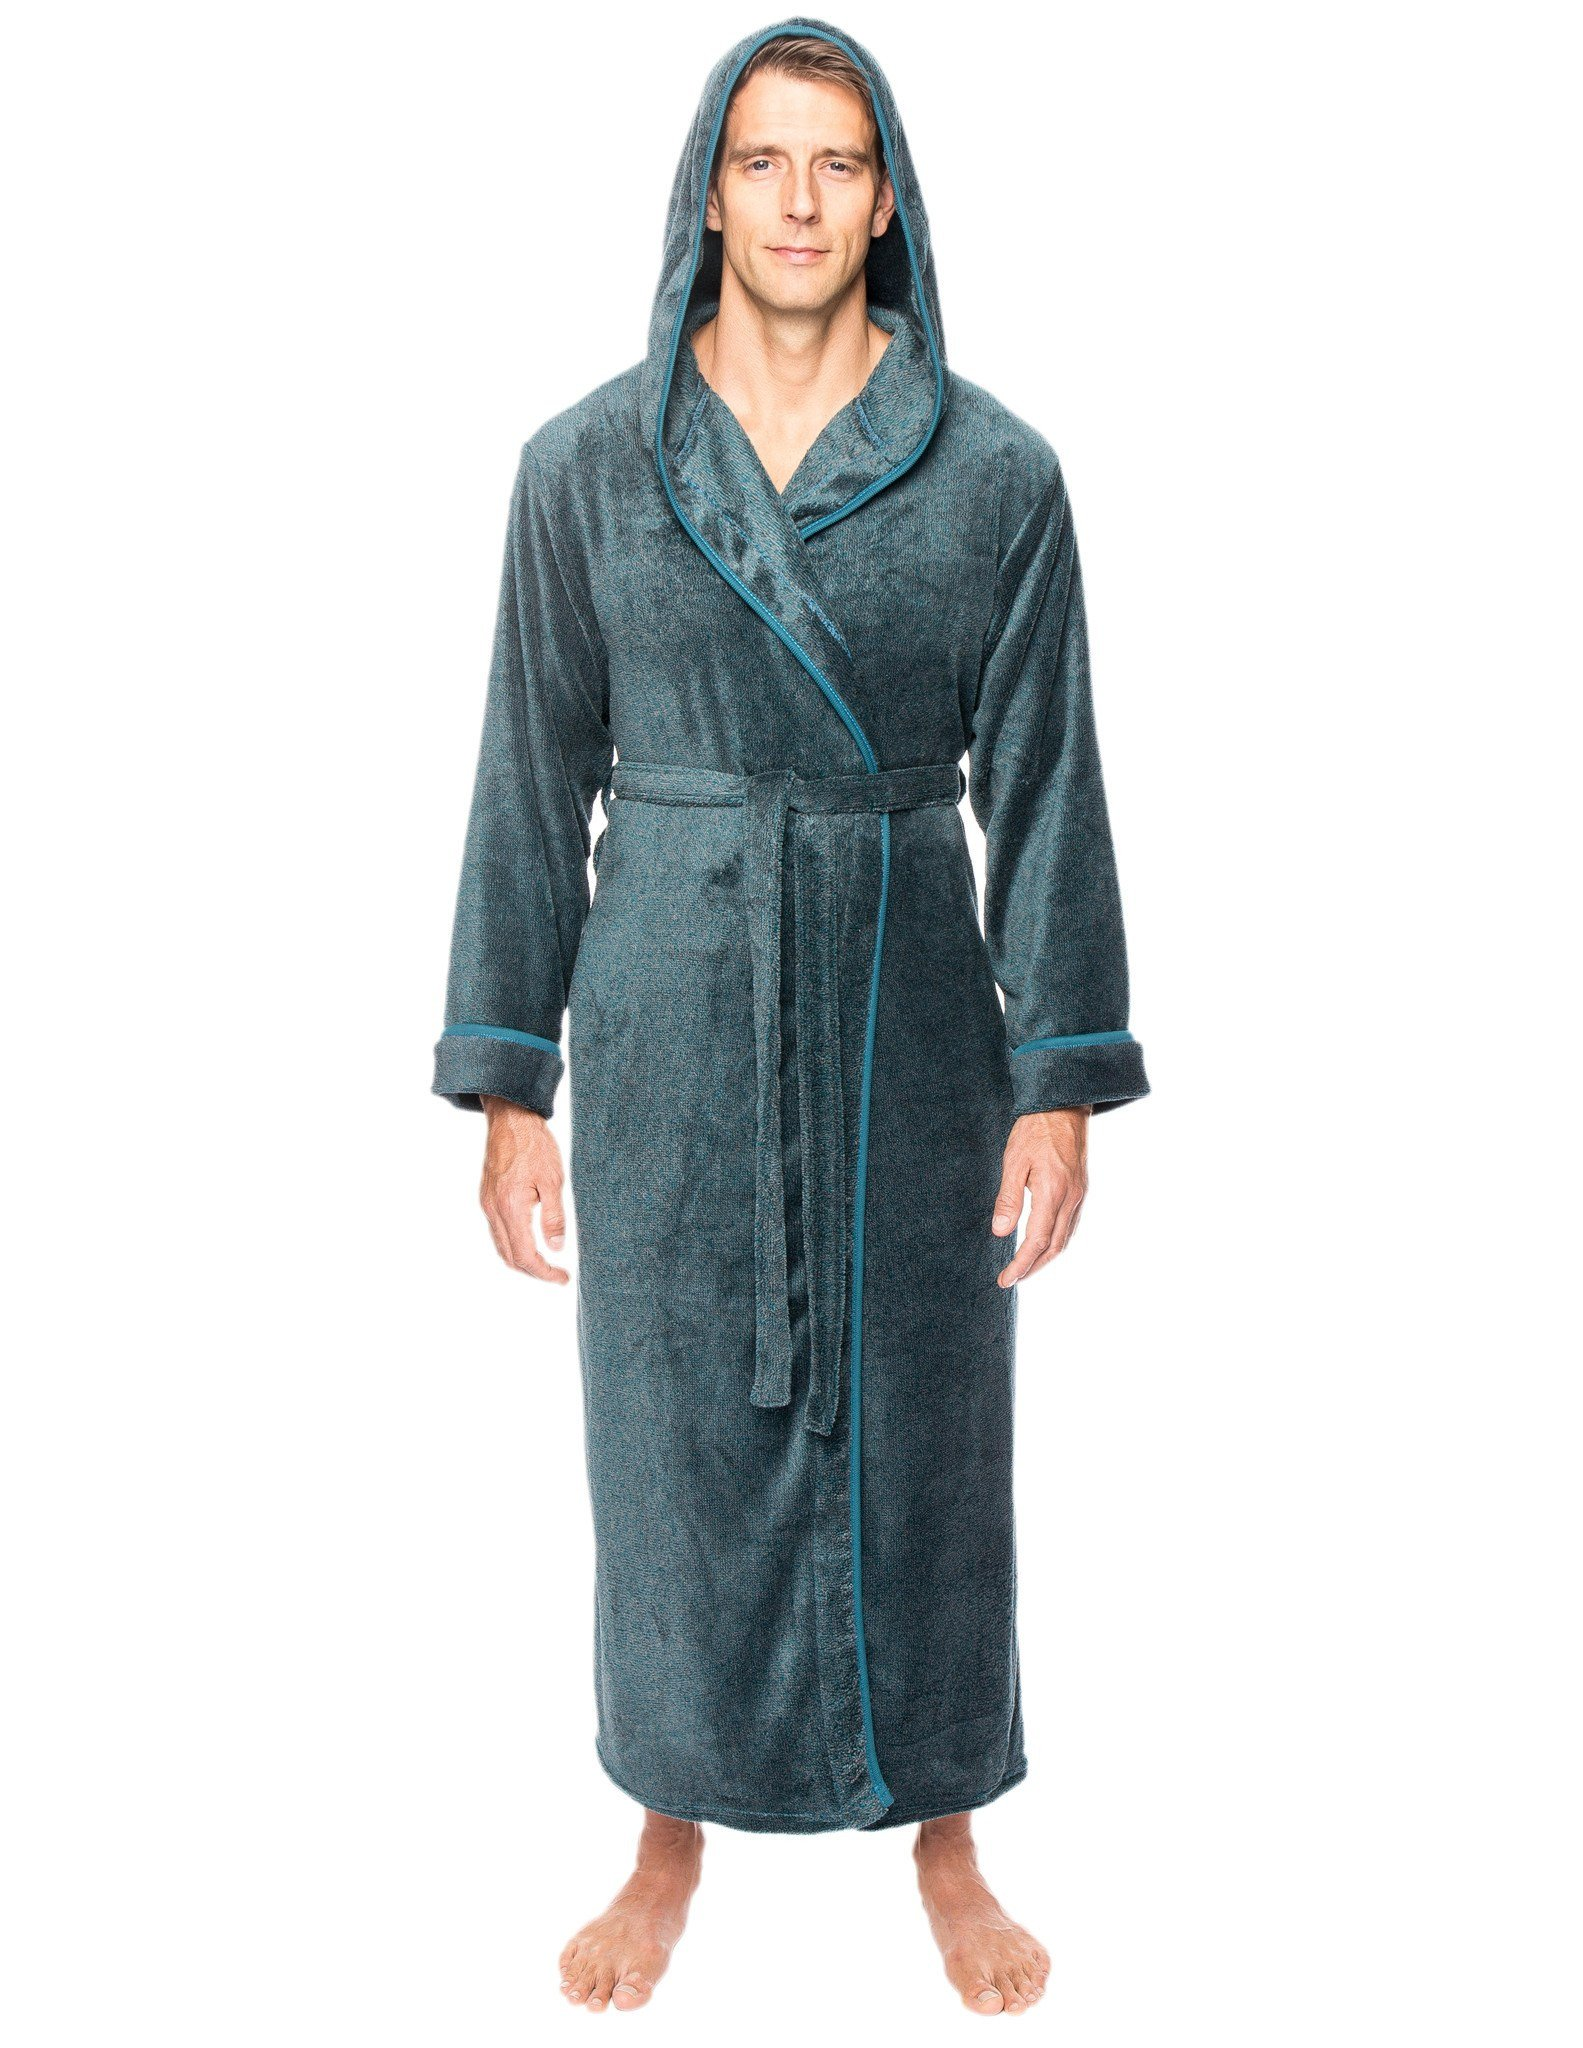 Noble Mount Men's Premium Coral Fleece Long Hooded Plush Spa/Bath Robe